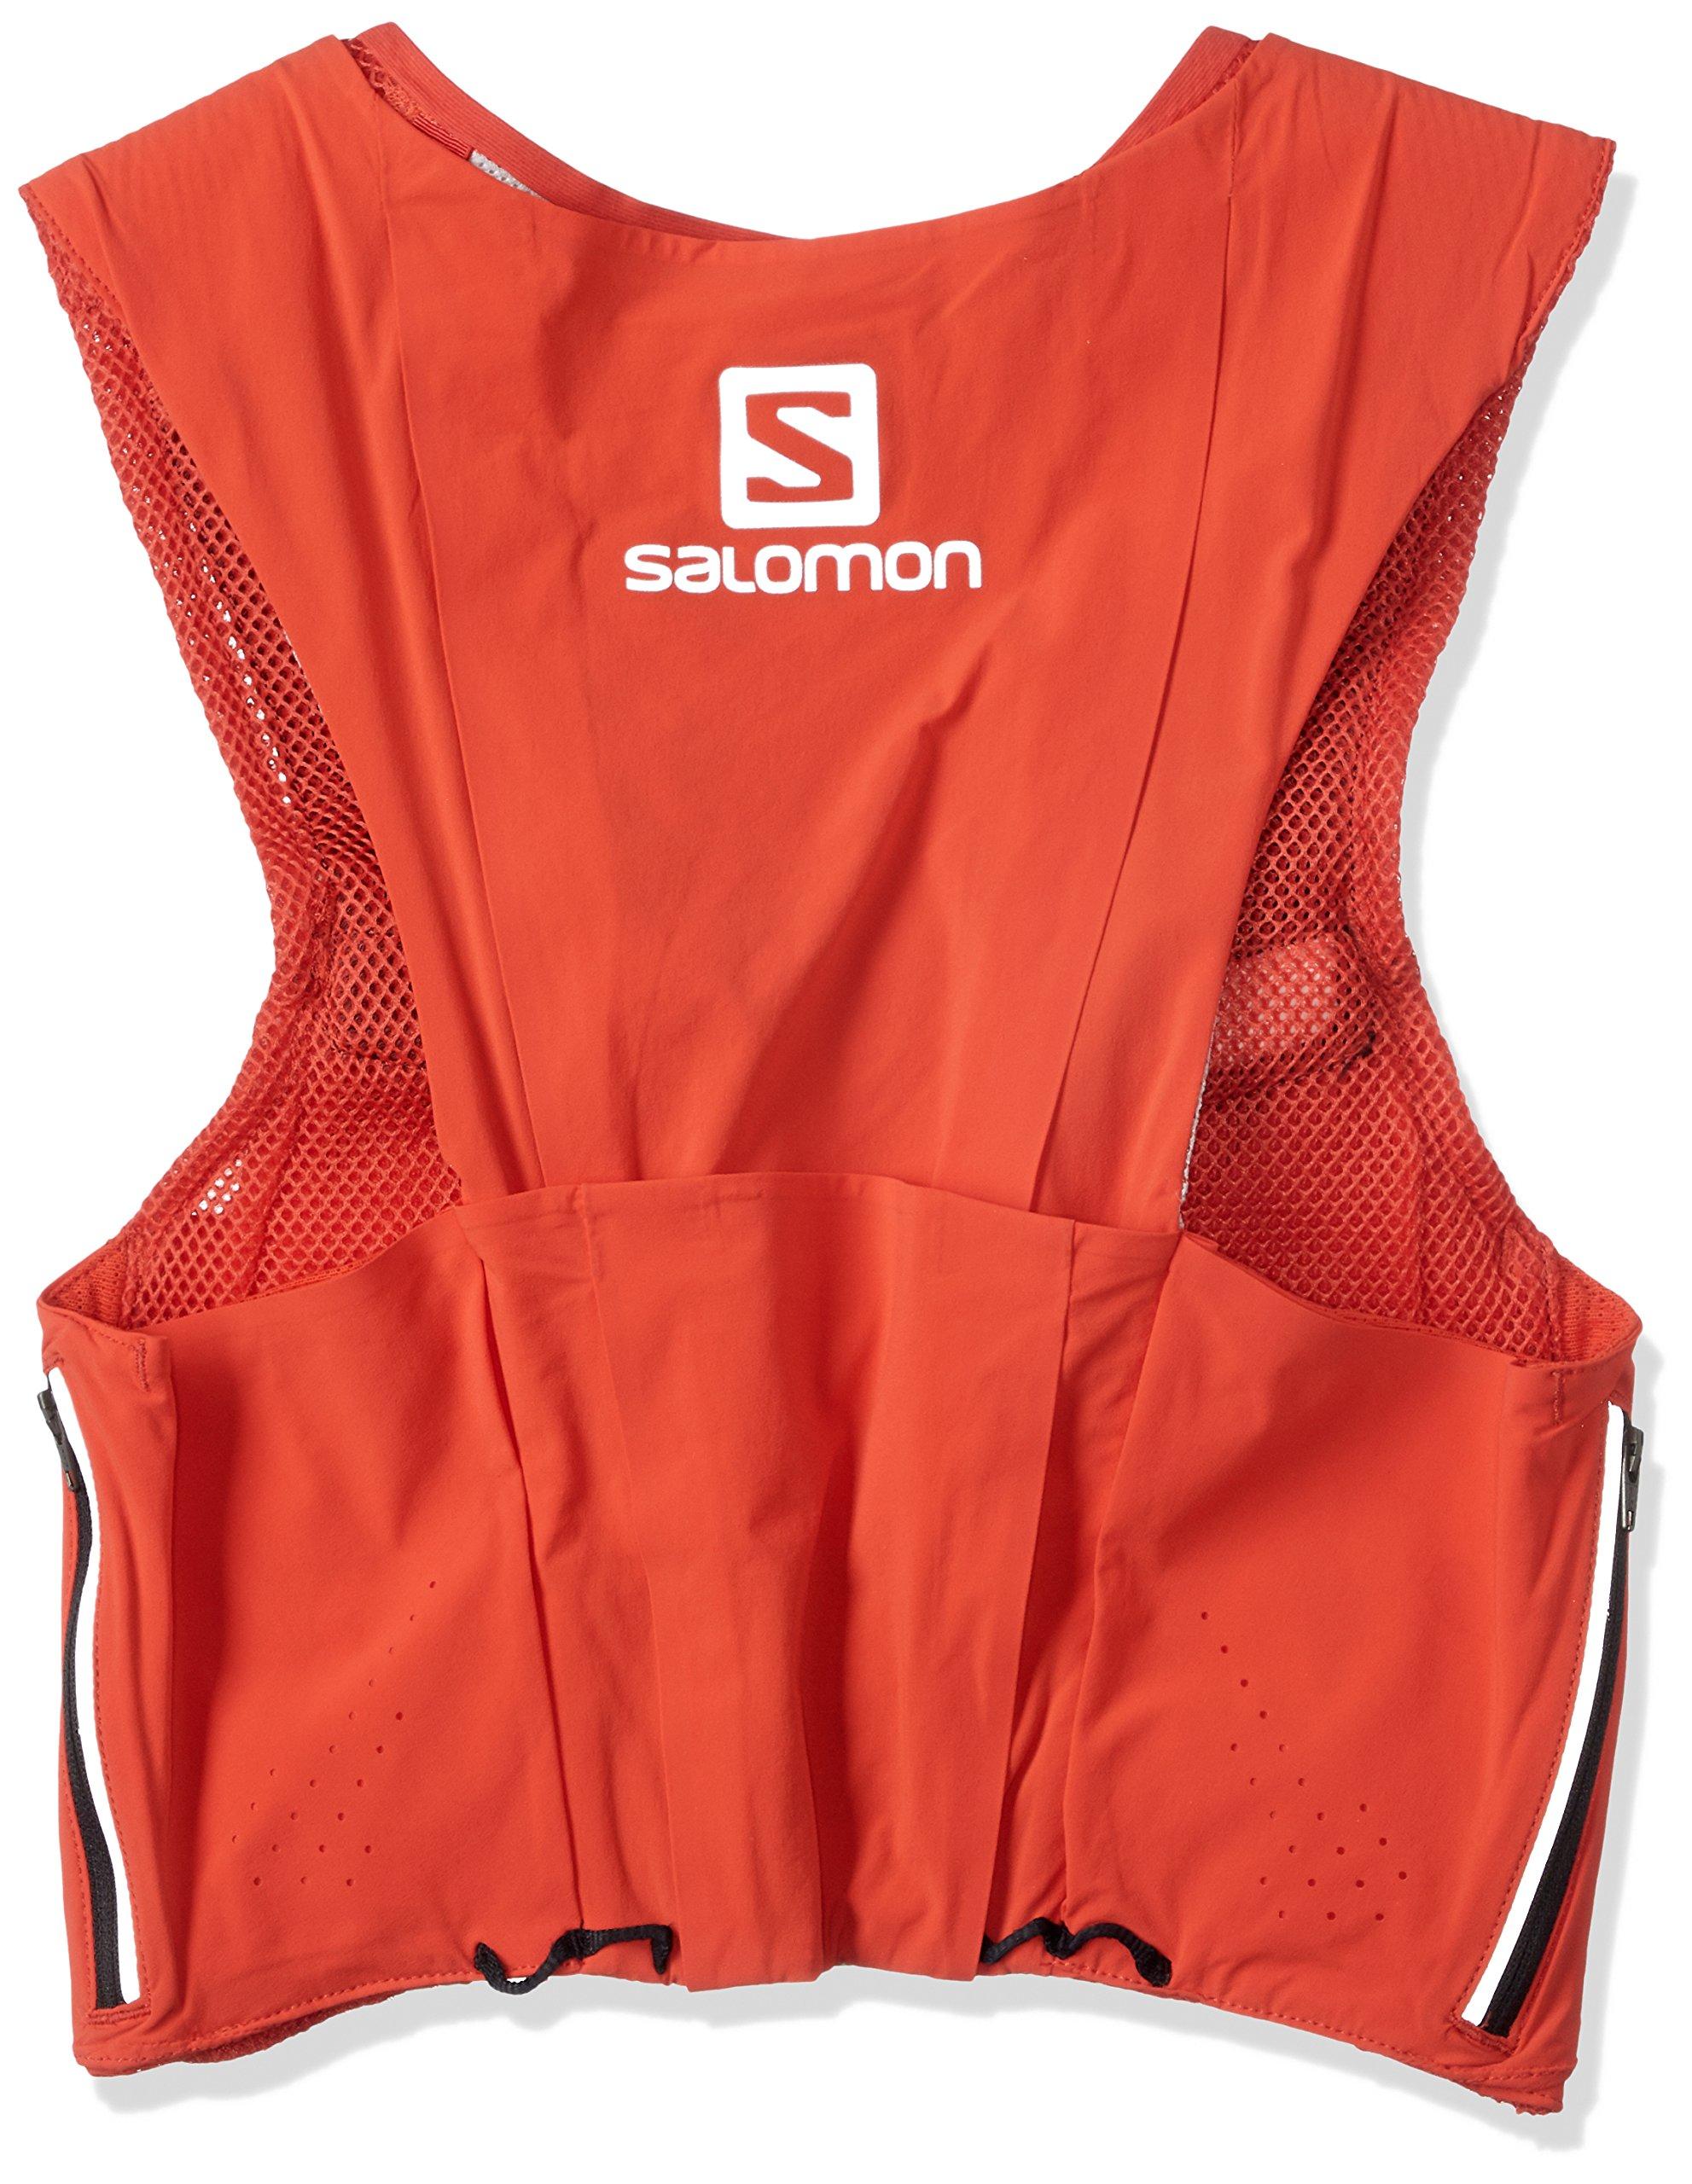 Salomon Unisex S/Lab Sense Ultra 8 Set Hydration Vest, Racing Red, Medium by Salomon (Image #2)